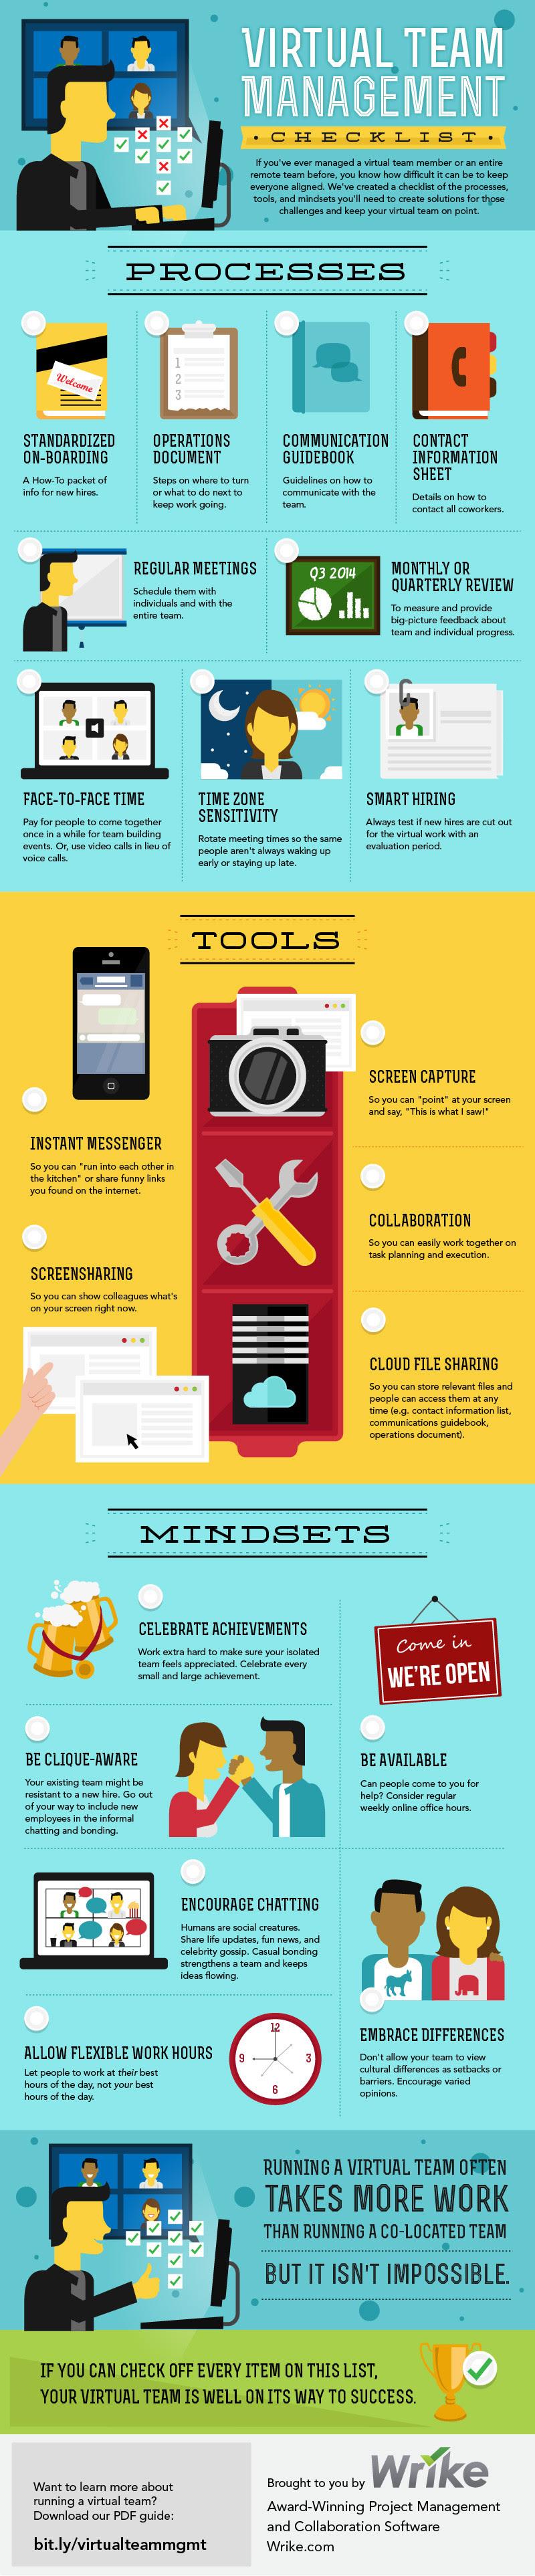 Infographic: Virtual Team Management Checklist